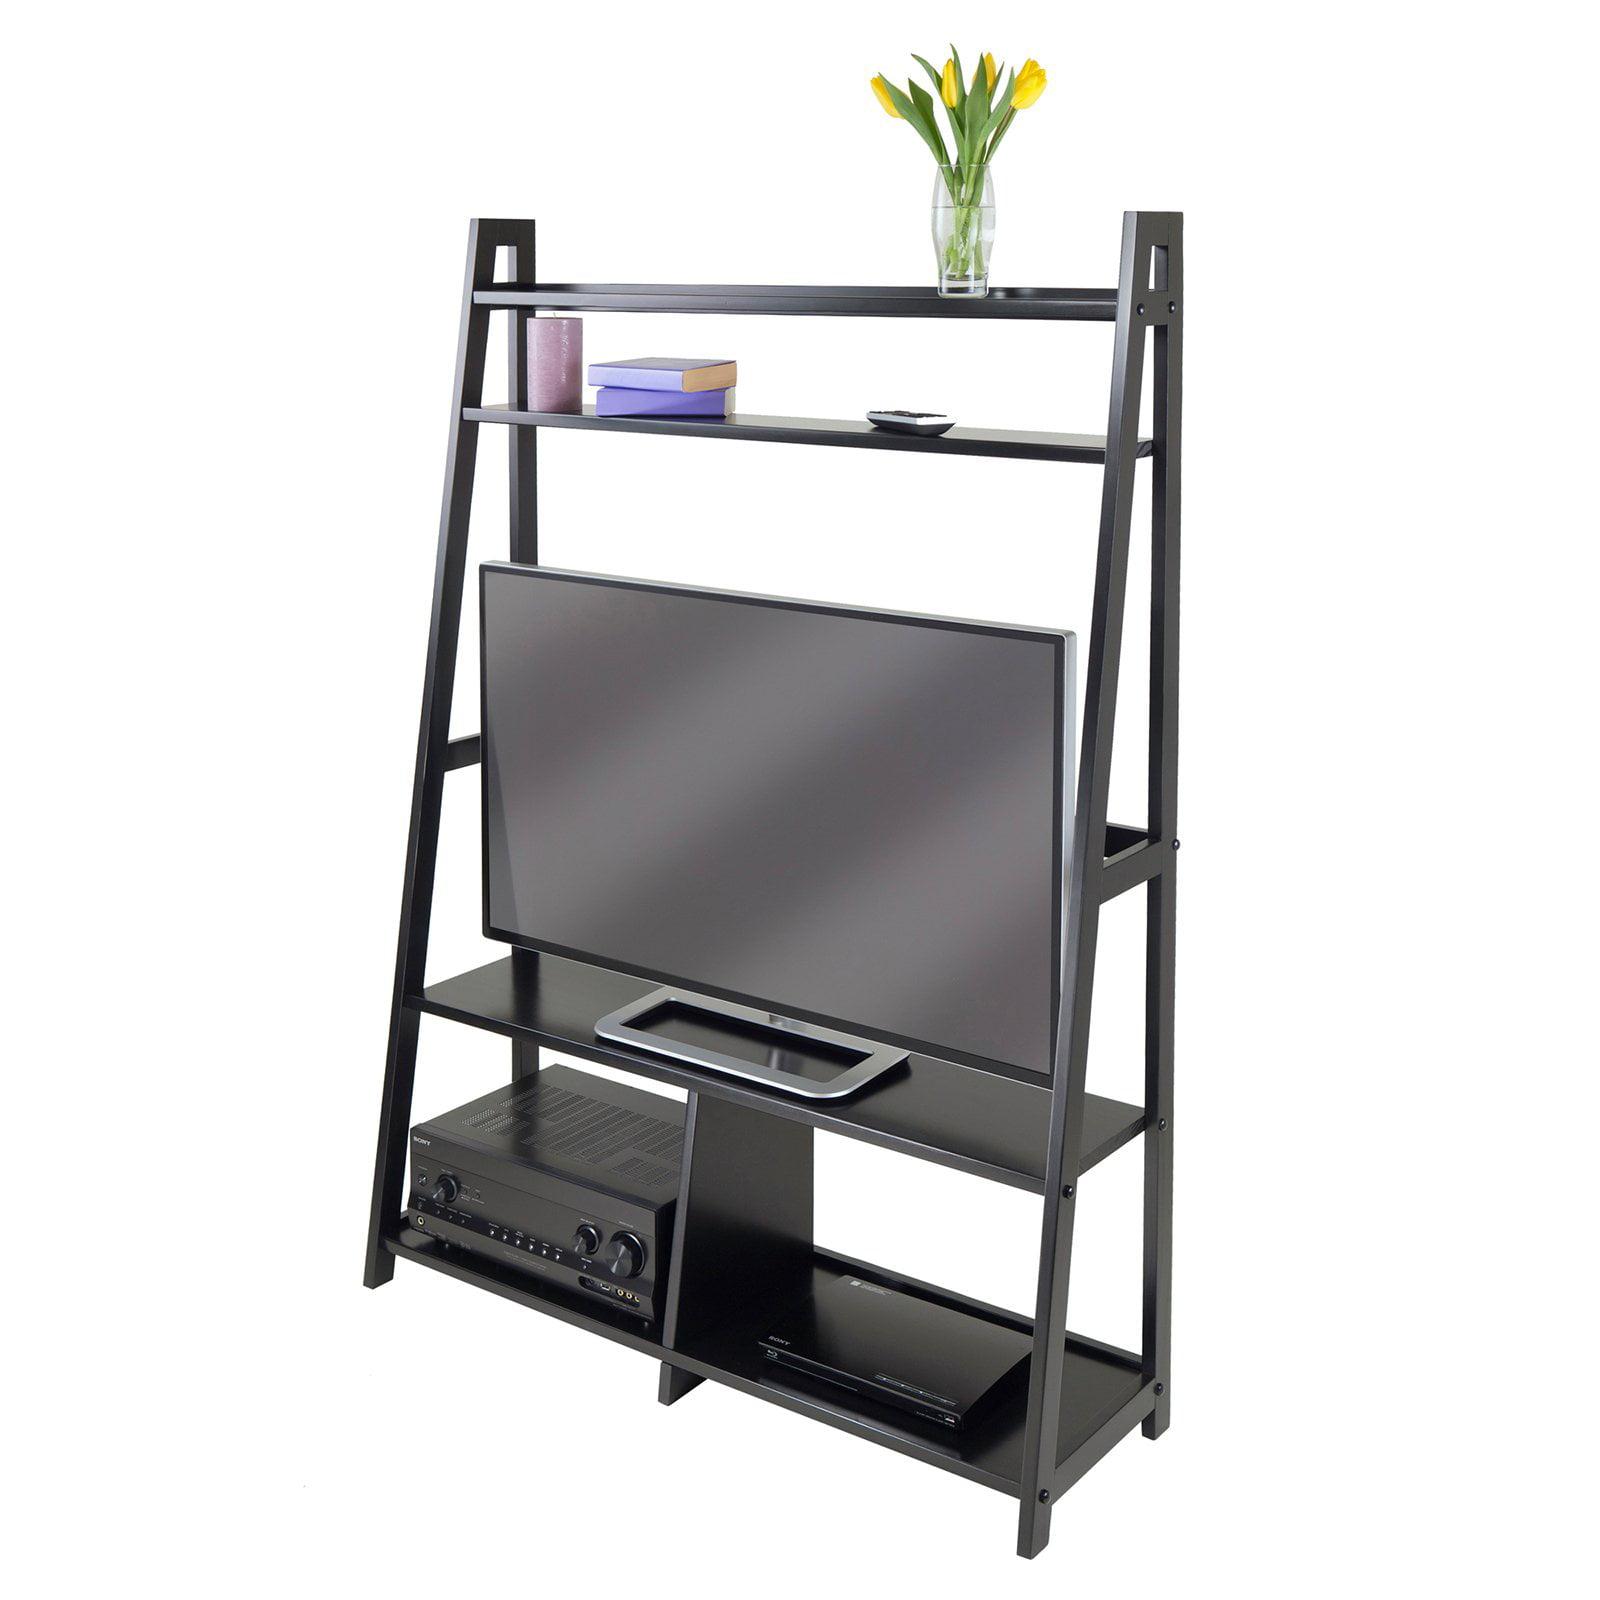 Set of 4 Single TV Table, Walnut - Walmart.com